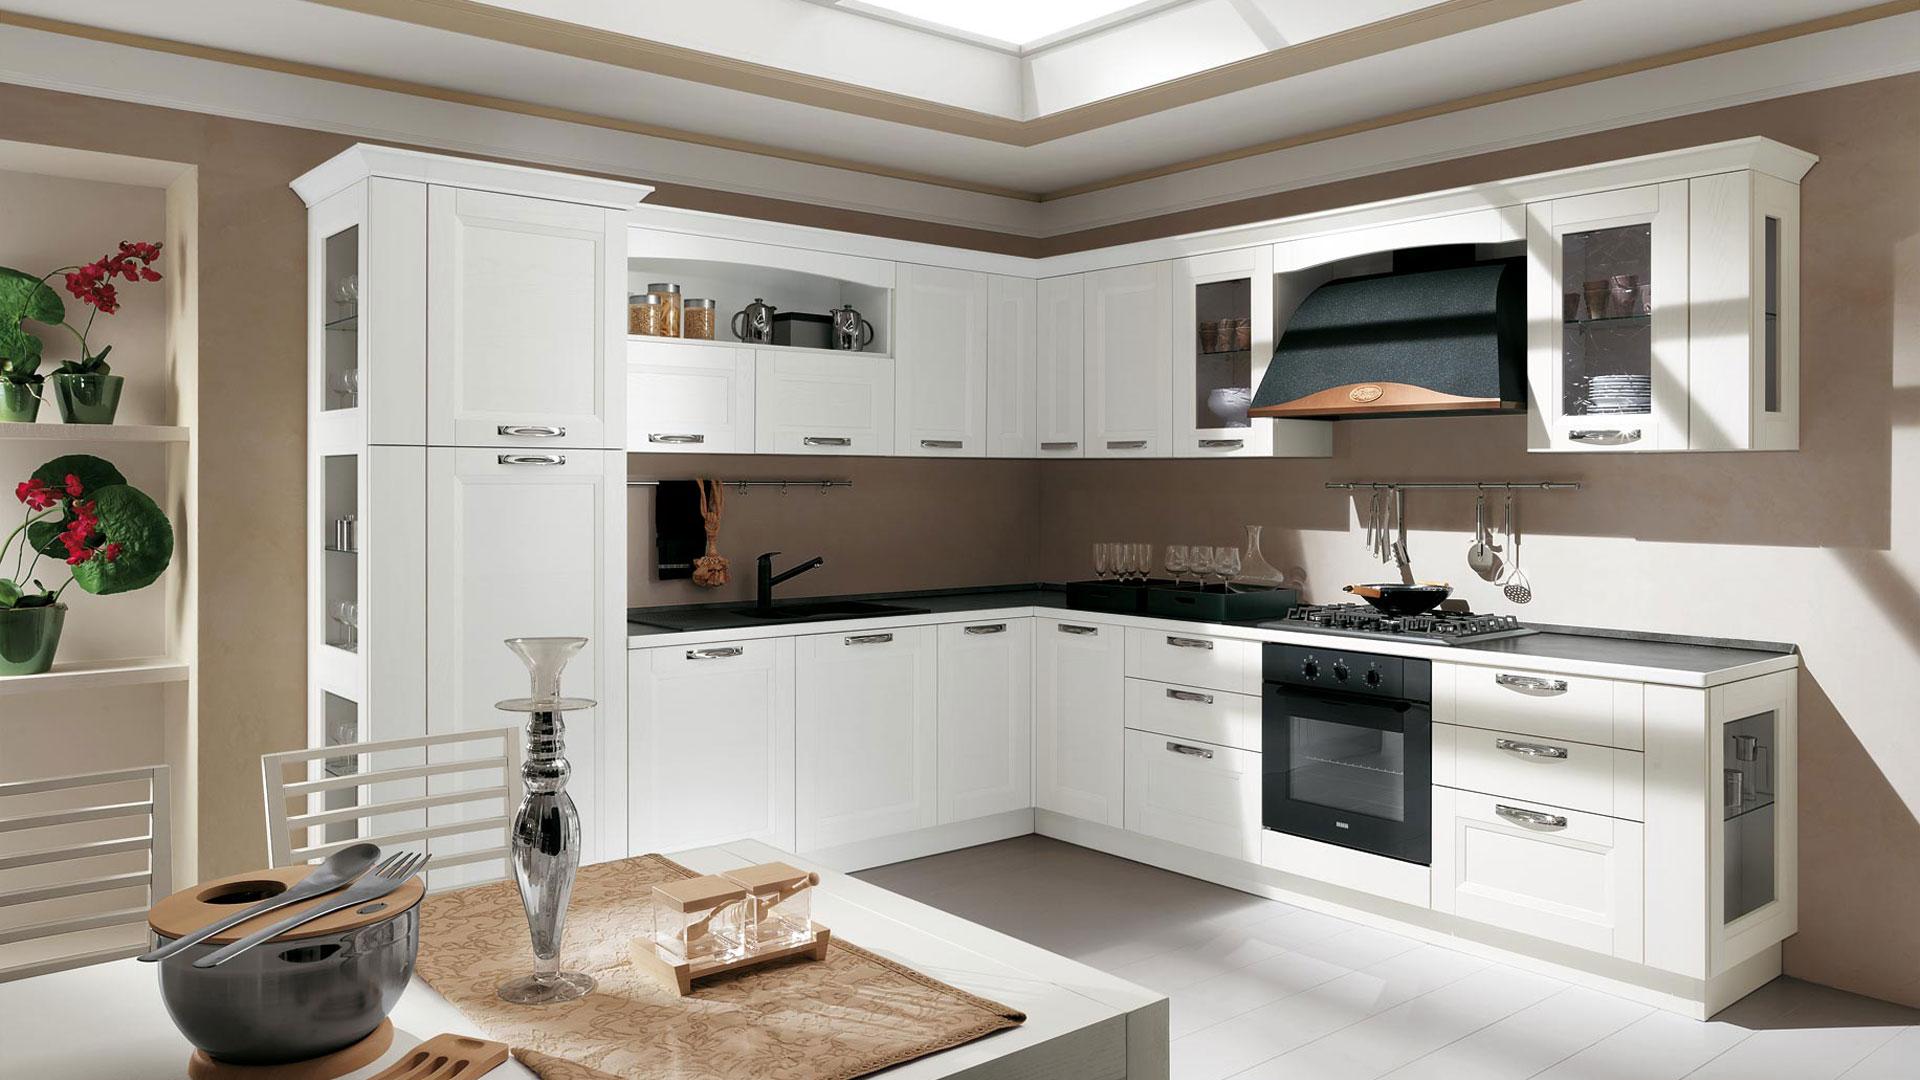 Come arredare la cucina schiavi for Idee arredo cucina classica